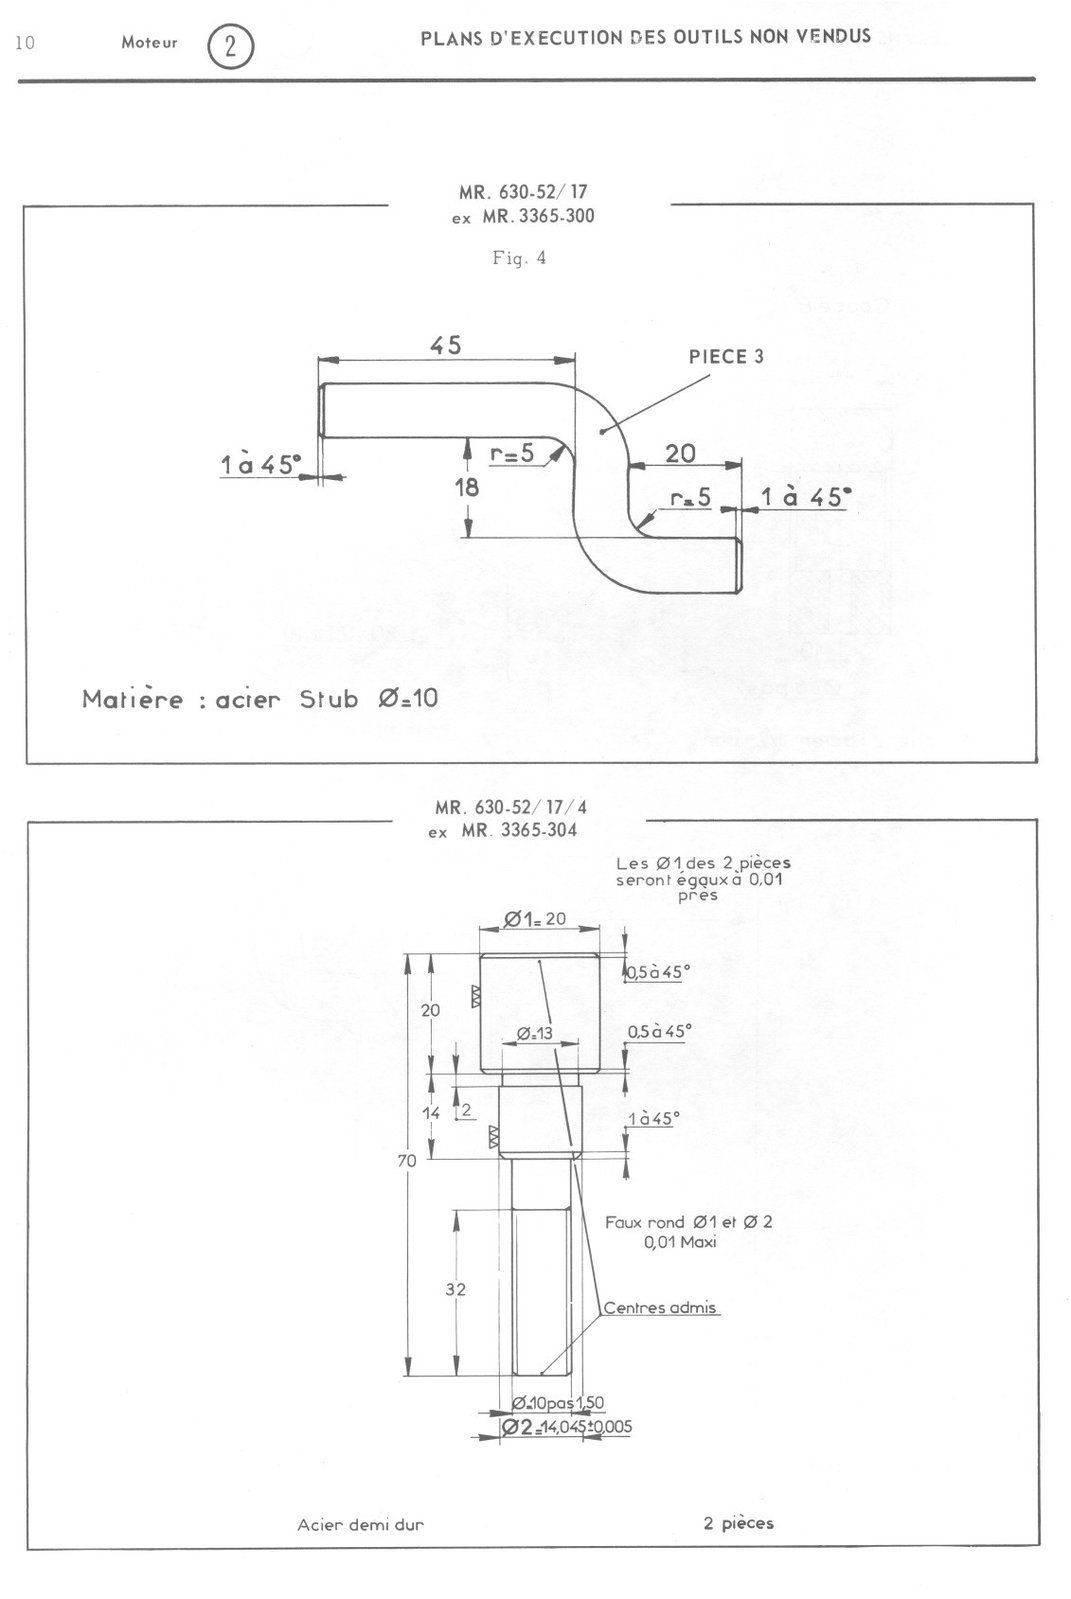 MR-630-52-17-4.jpg